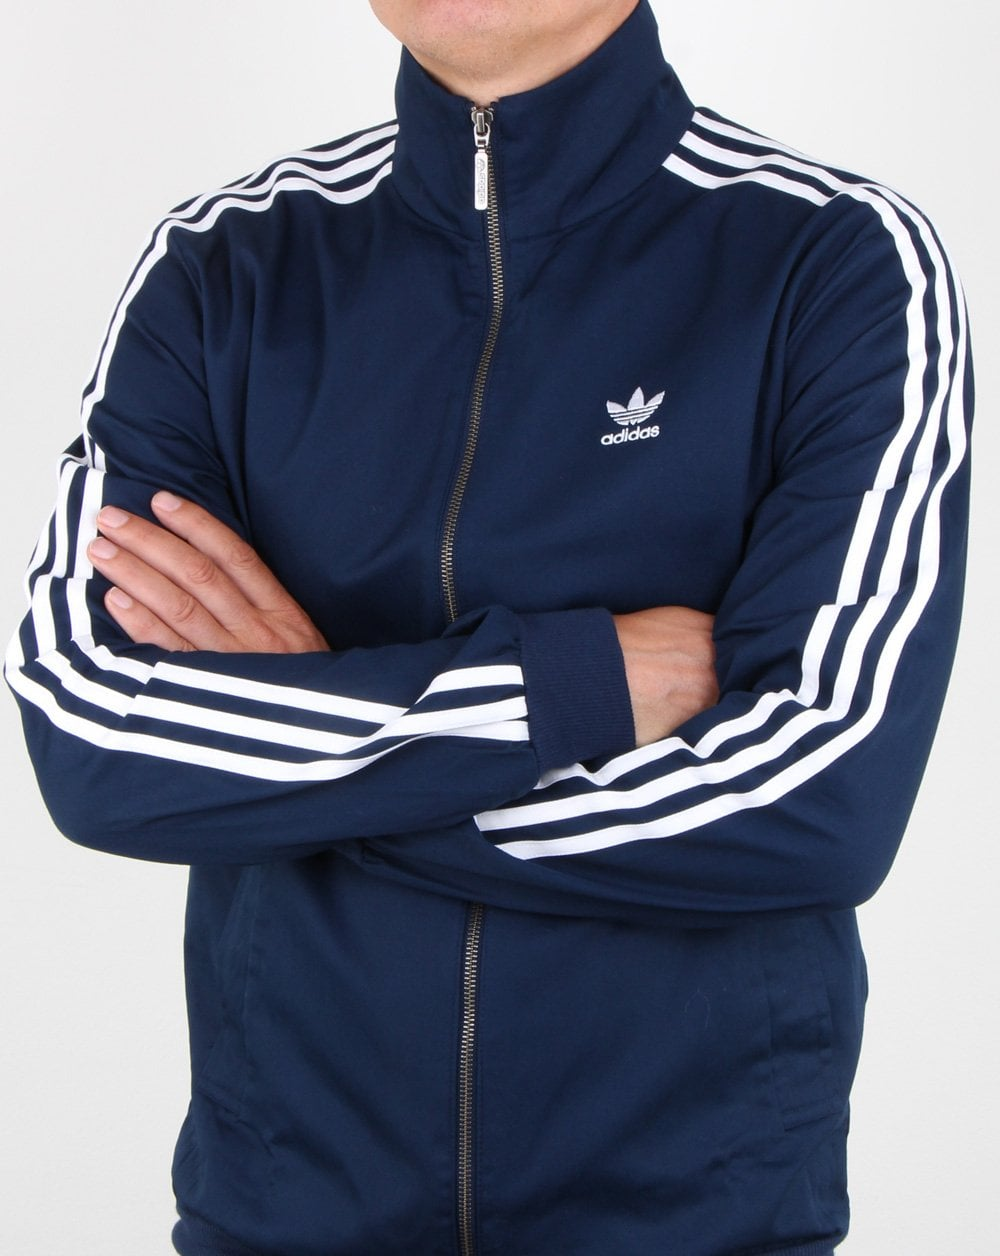 adidas Beckenbauer track top navy